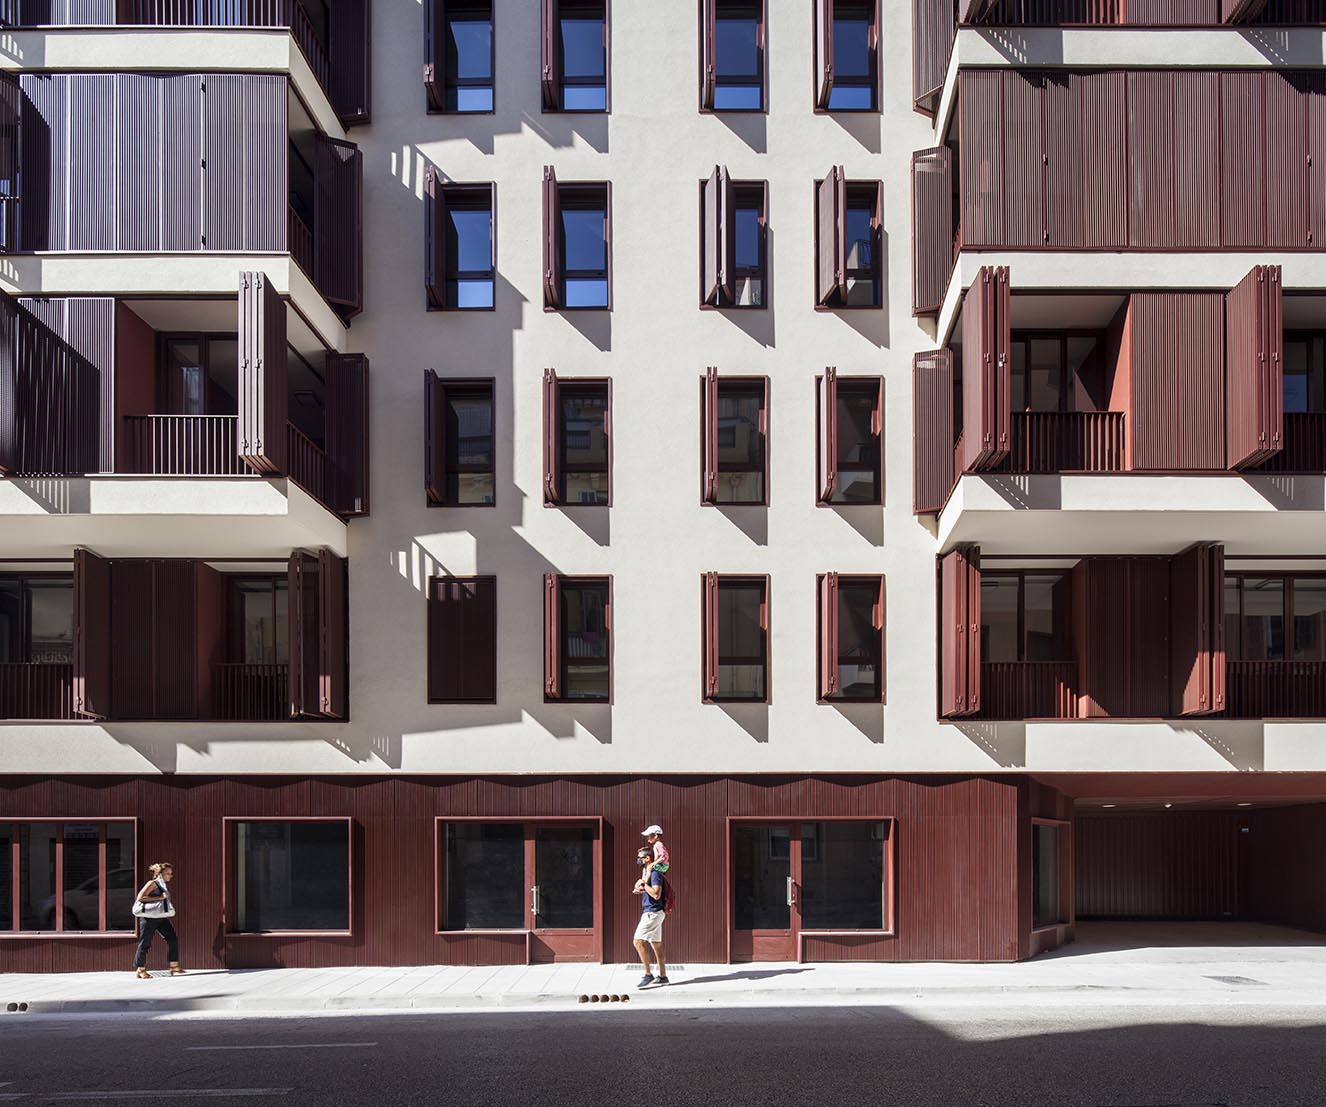 billy-goffard-architecte COMBOUL architecture 06 paca